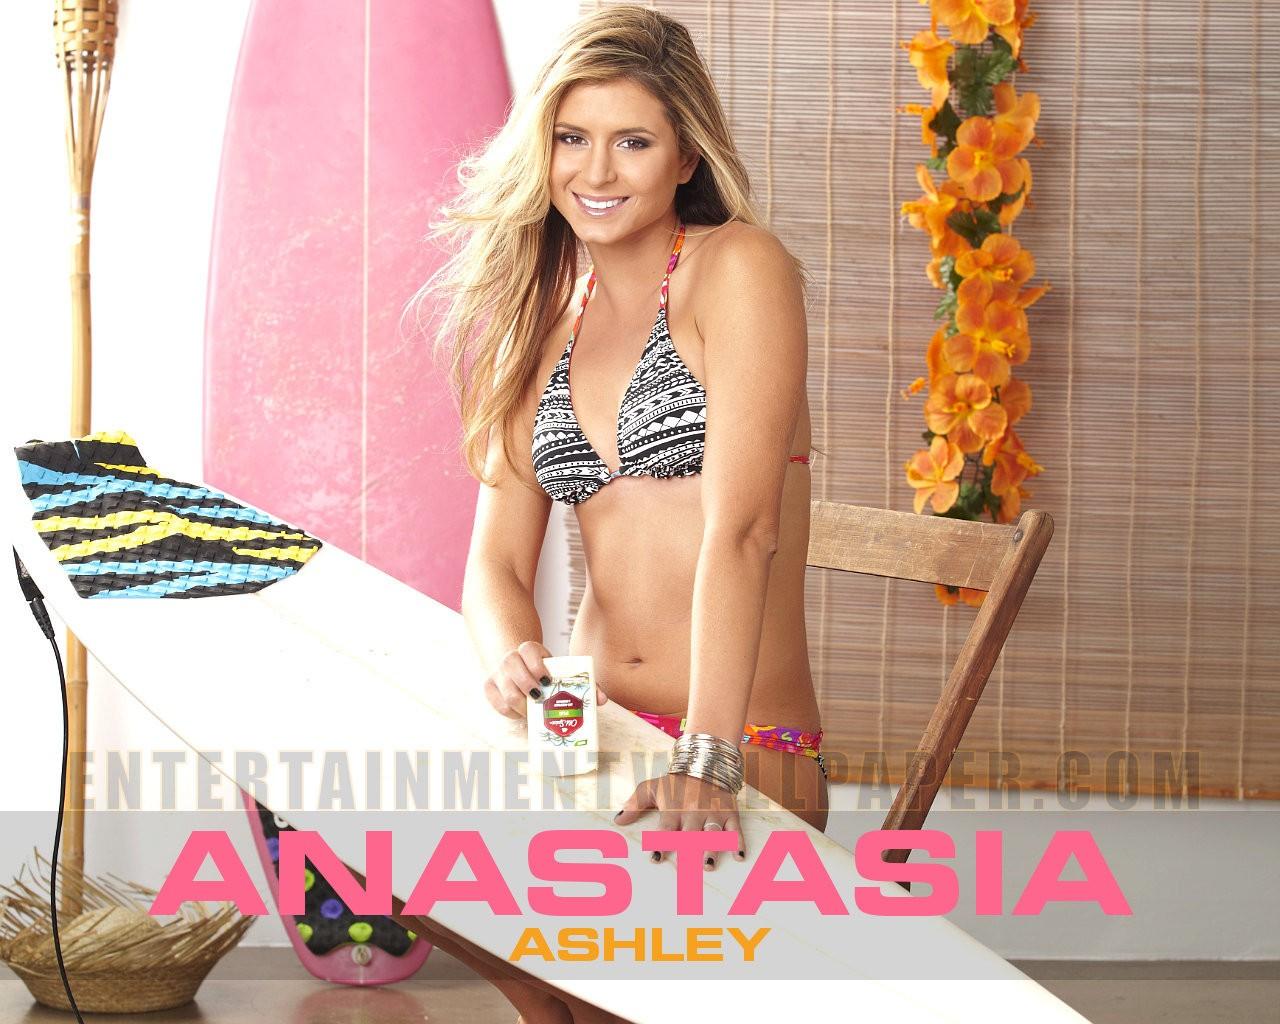 Anastasia Ashley - HD Wallpapers